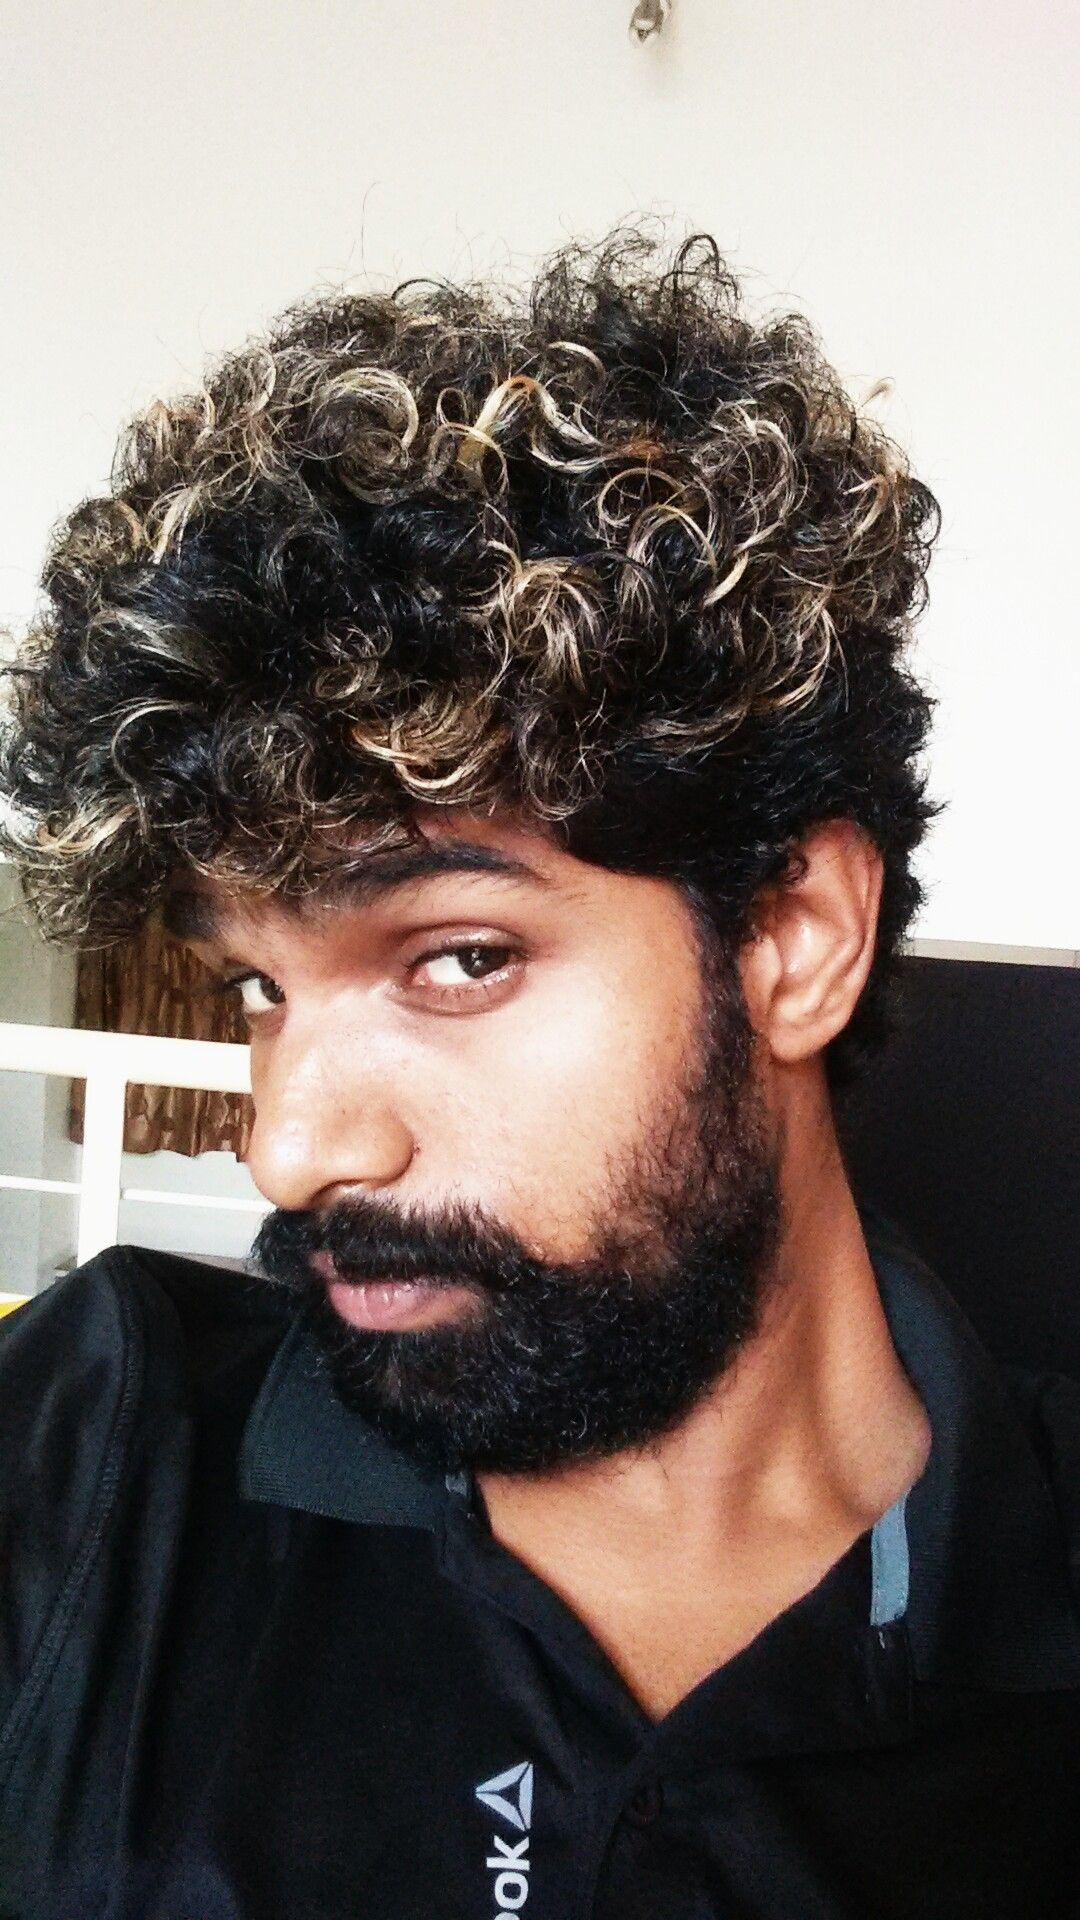 manoj gowda #Hair coloring #beard style #mysore #manu #manoj gowda ...